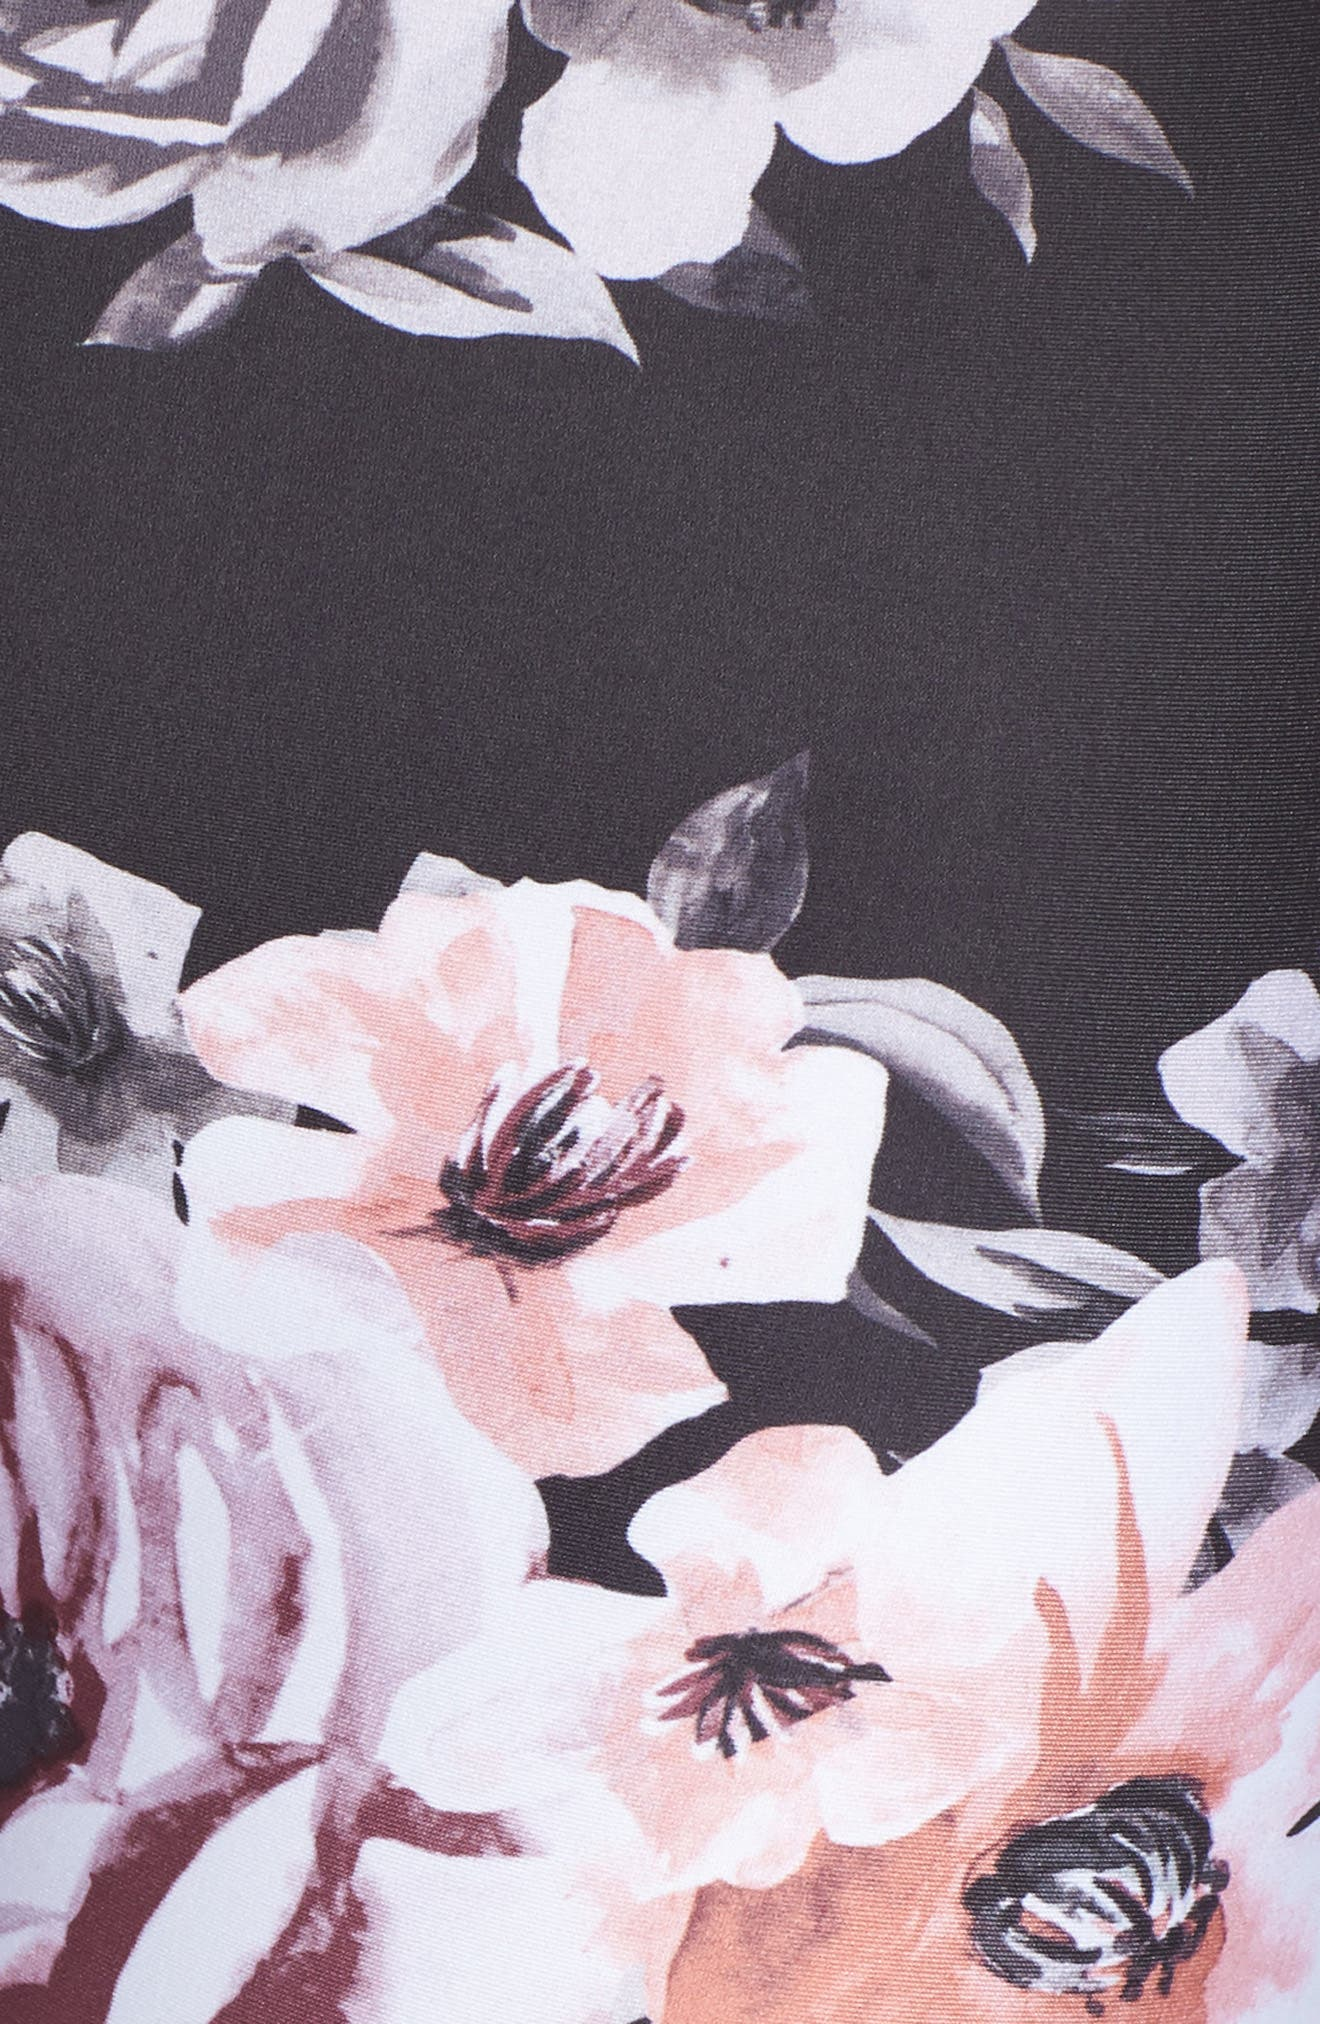 Vera Print Crop Leggings,                             Alternate thumbnail 6, color,                             BLACK CLASSIC FLORAL PRINT